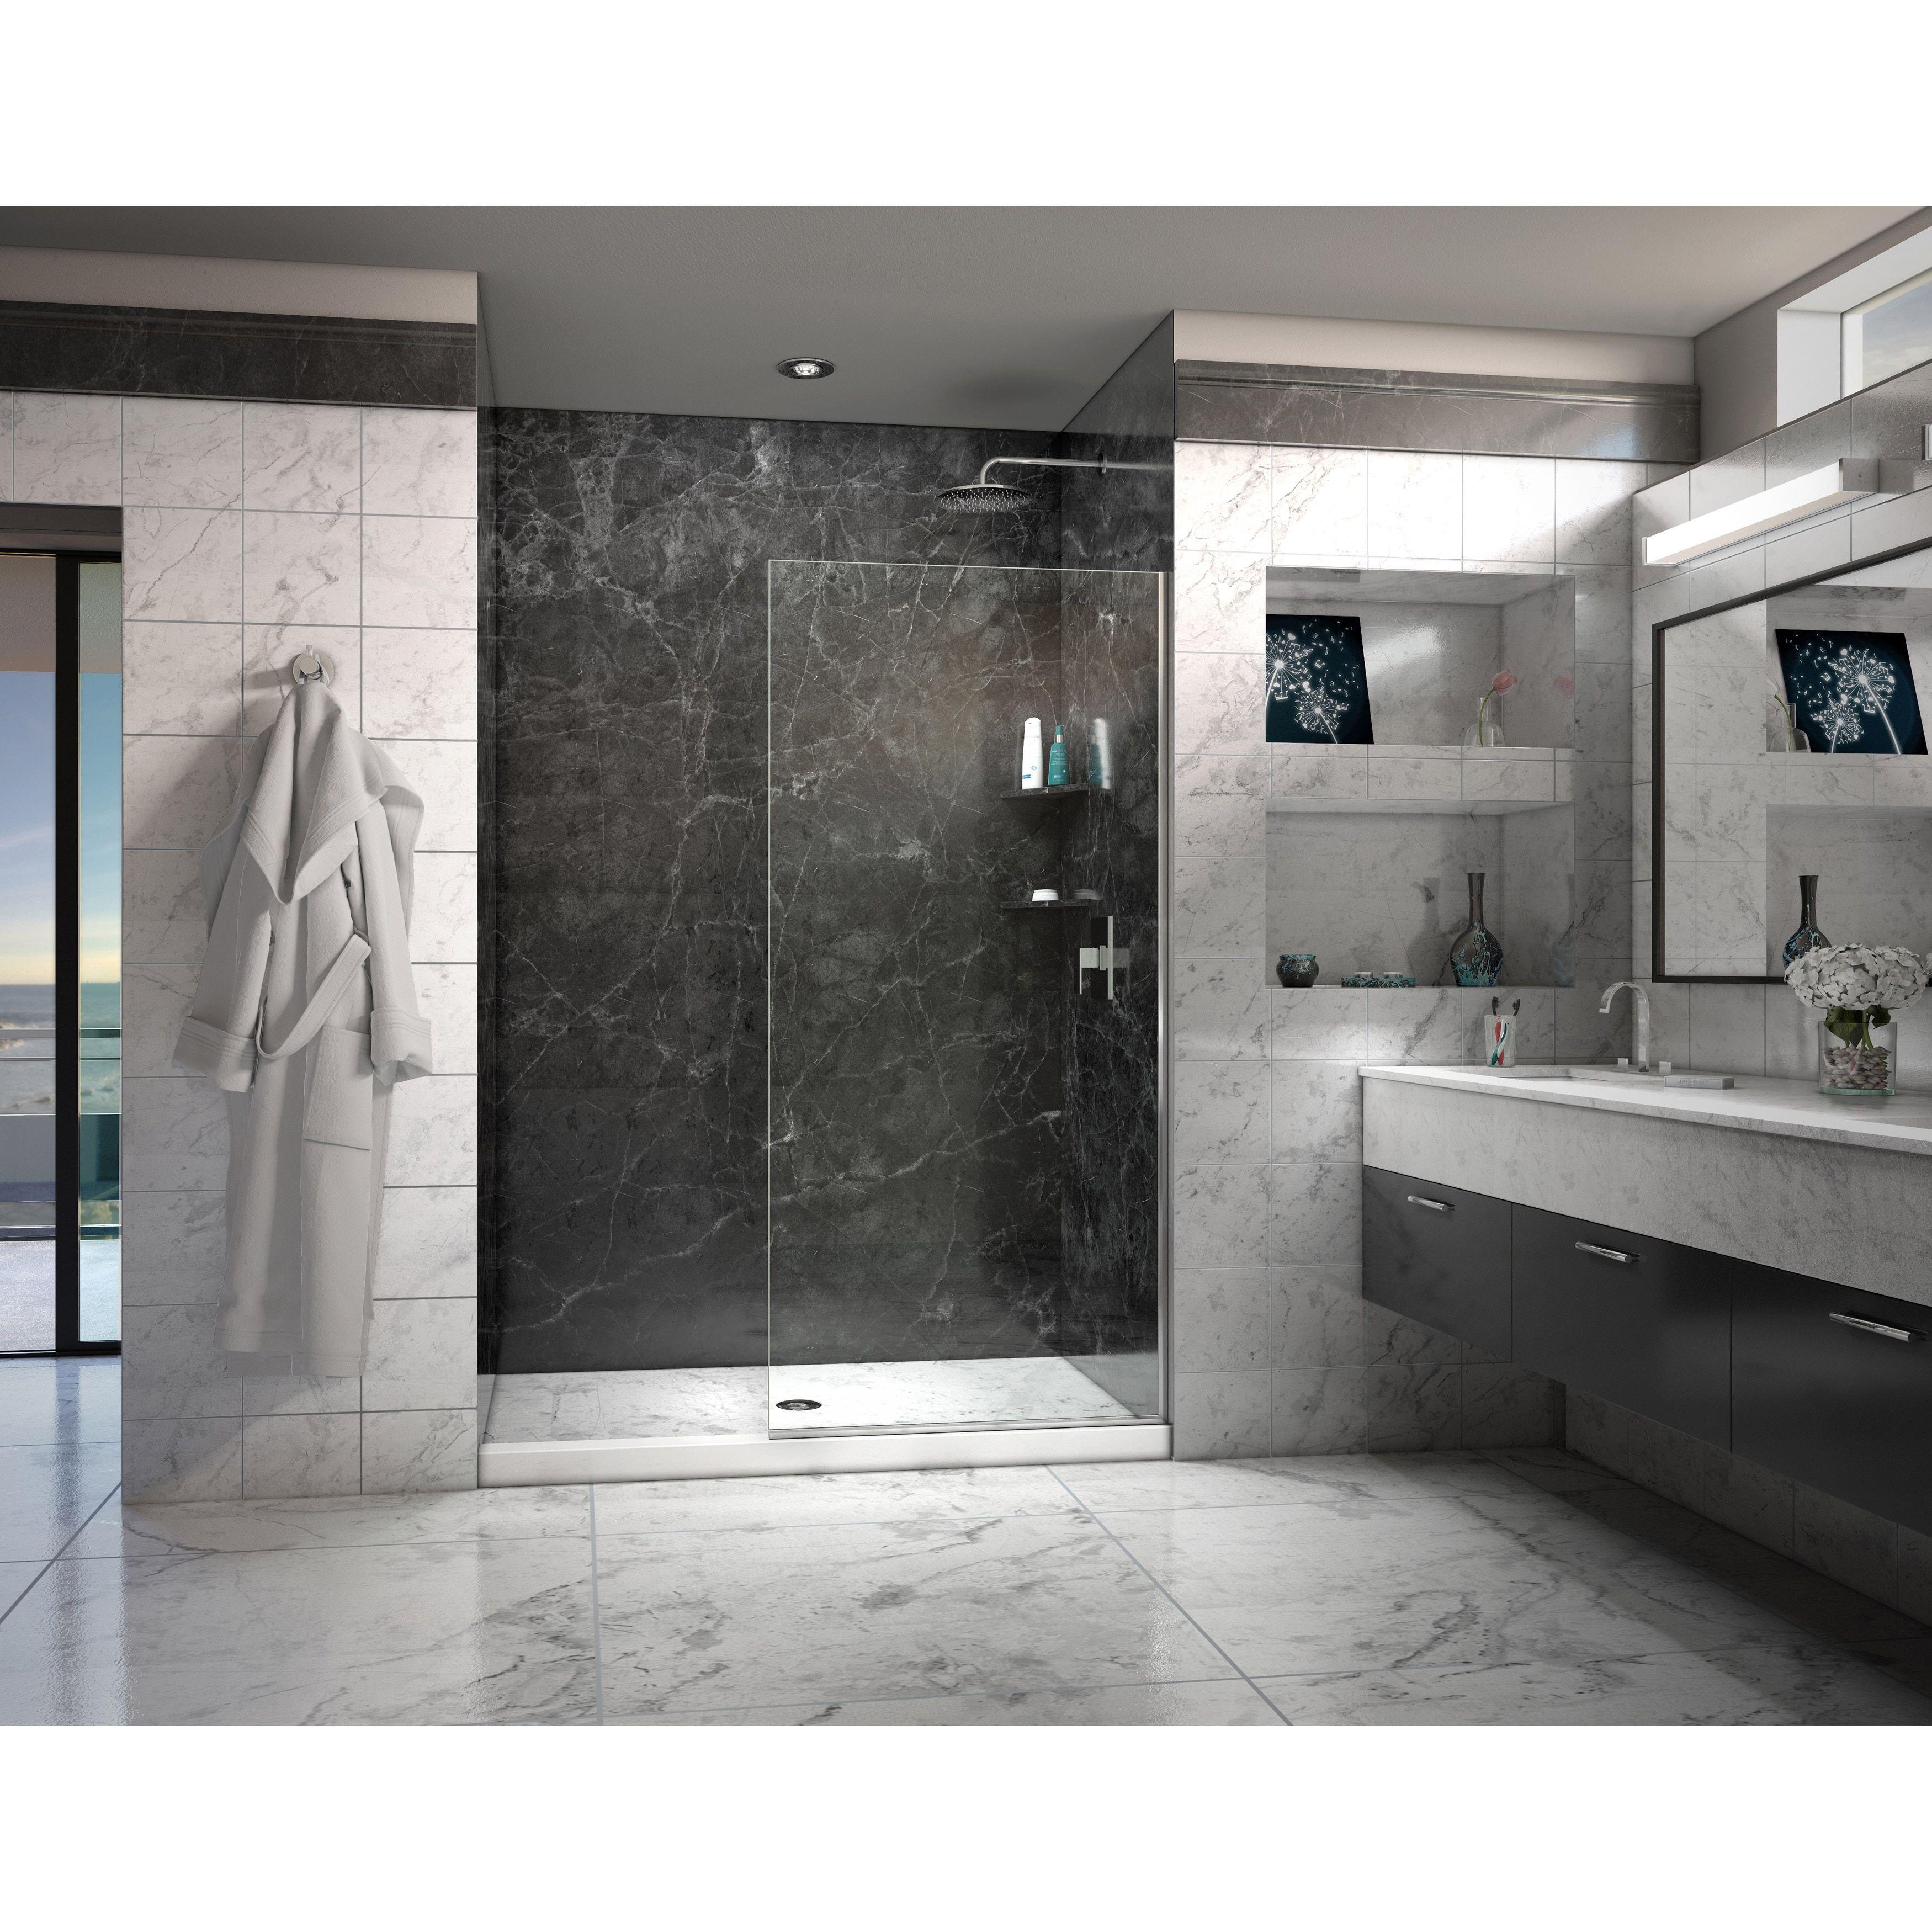 Linea Frameless Shower Door 34 In X 72 In Open Entry Design